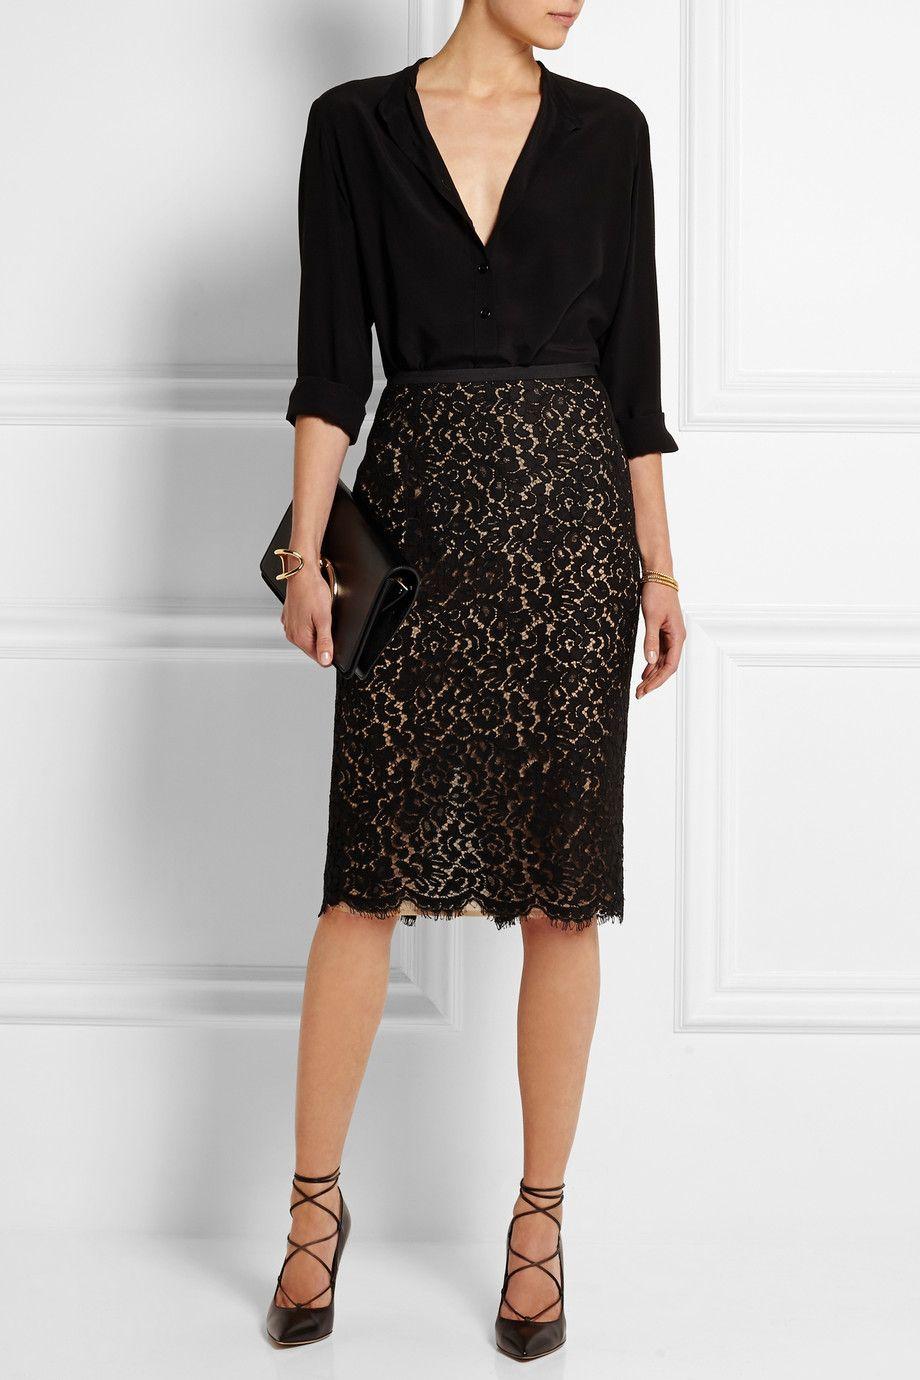 cce81b60e3 Michael Kors | Guipure lace pencil skirt | NET-A-PORTER.COM-lace skirt,  black heels More